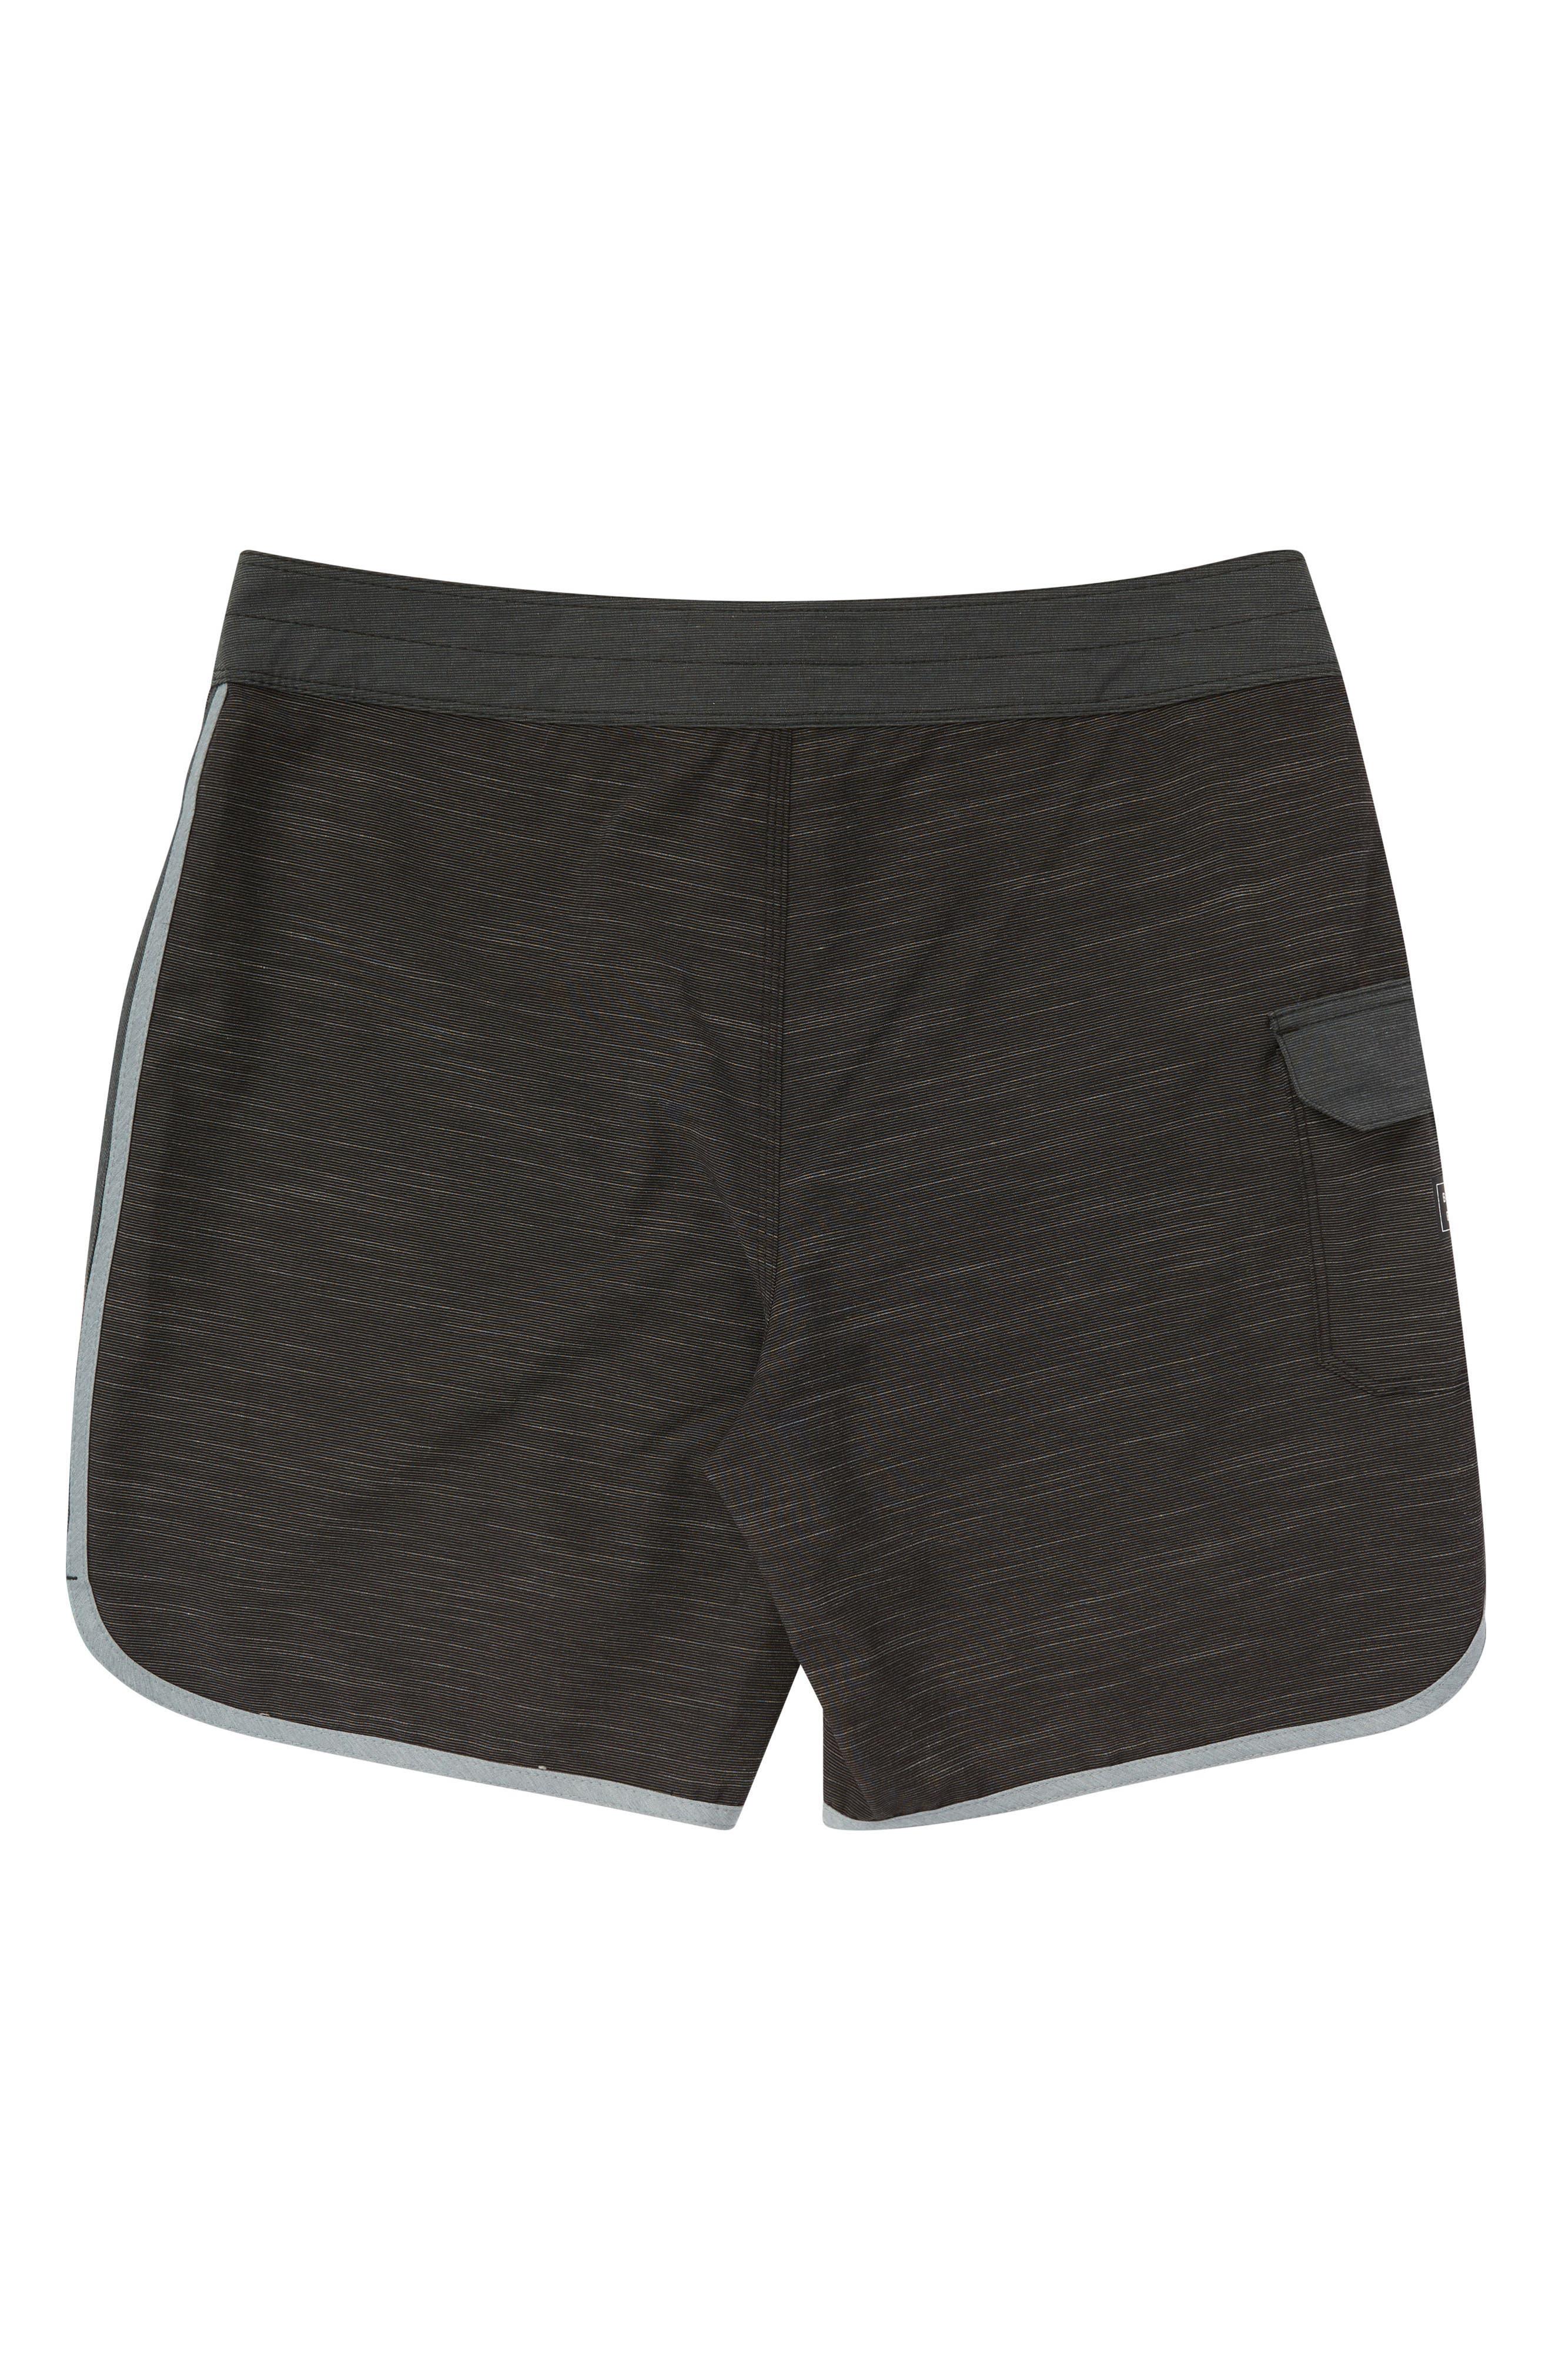 73 X Board Shorts,                             Alternate thumbnail 3, color,                             001